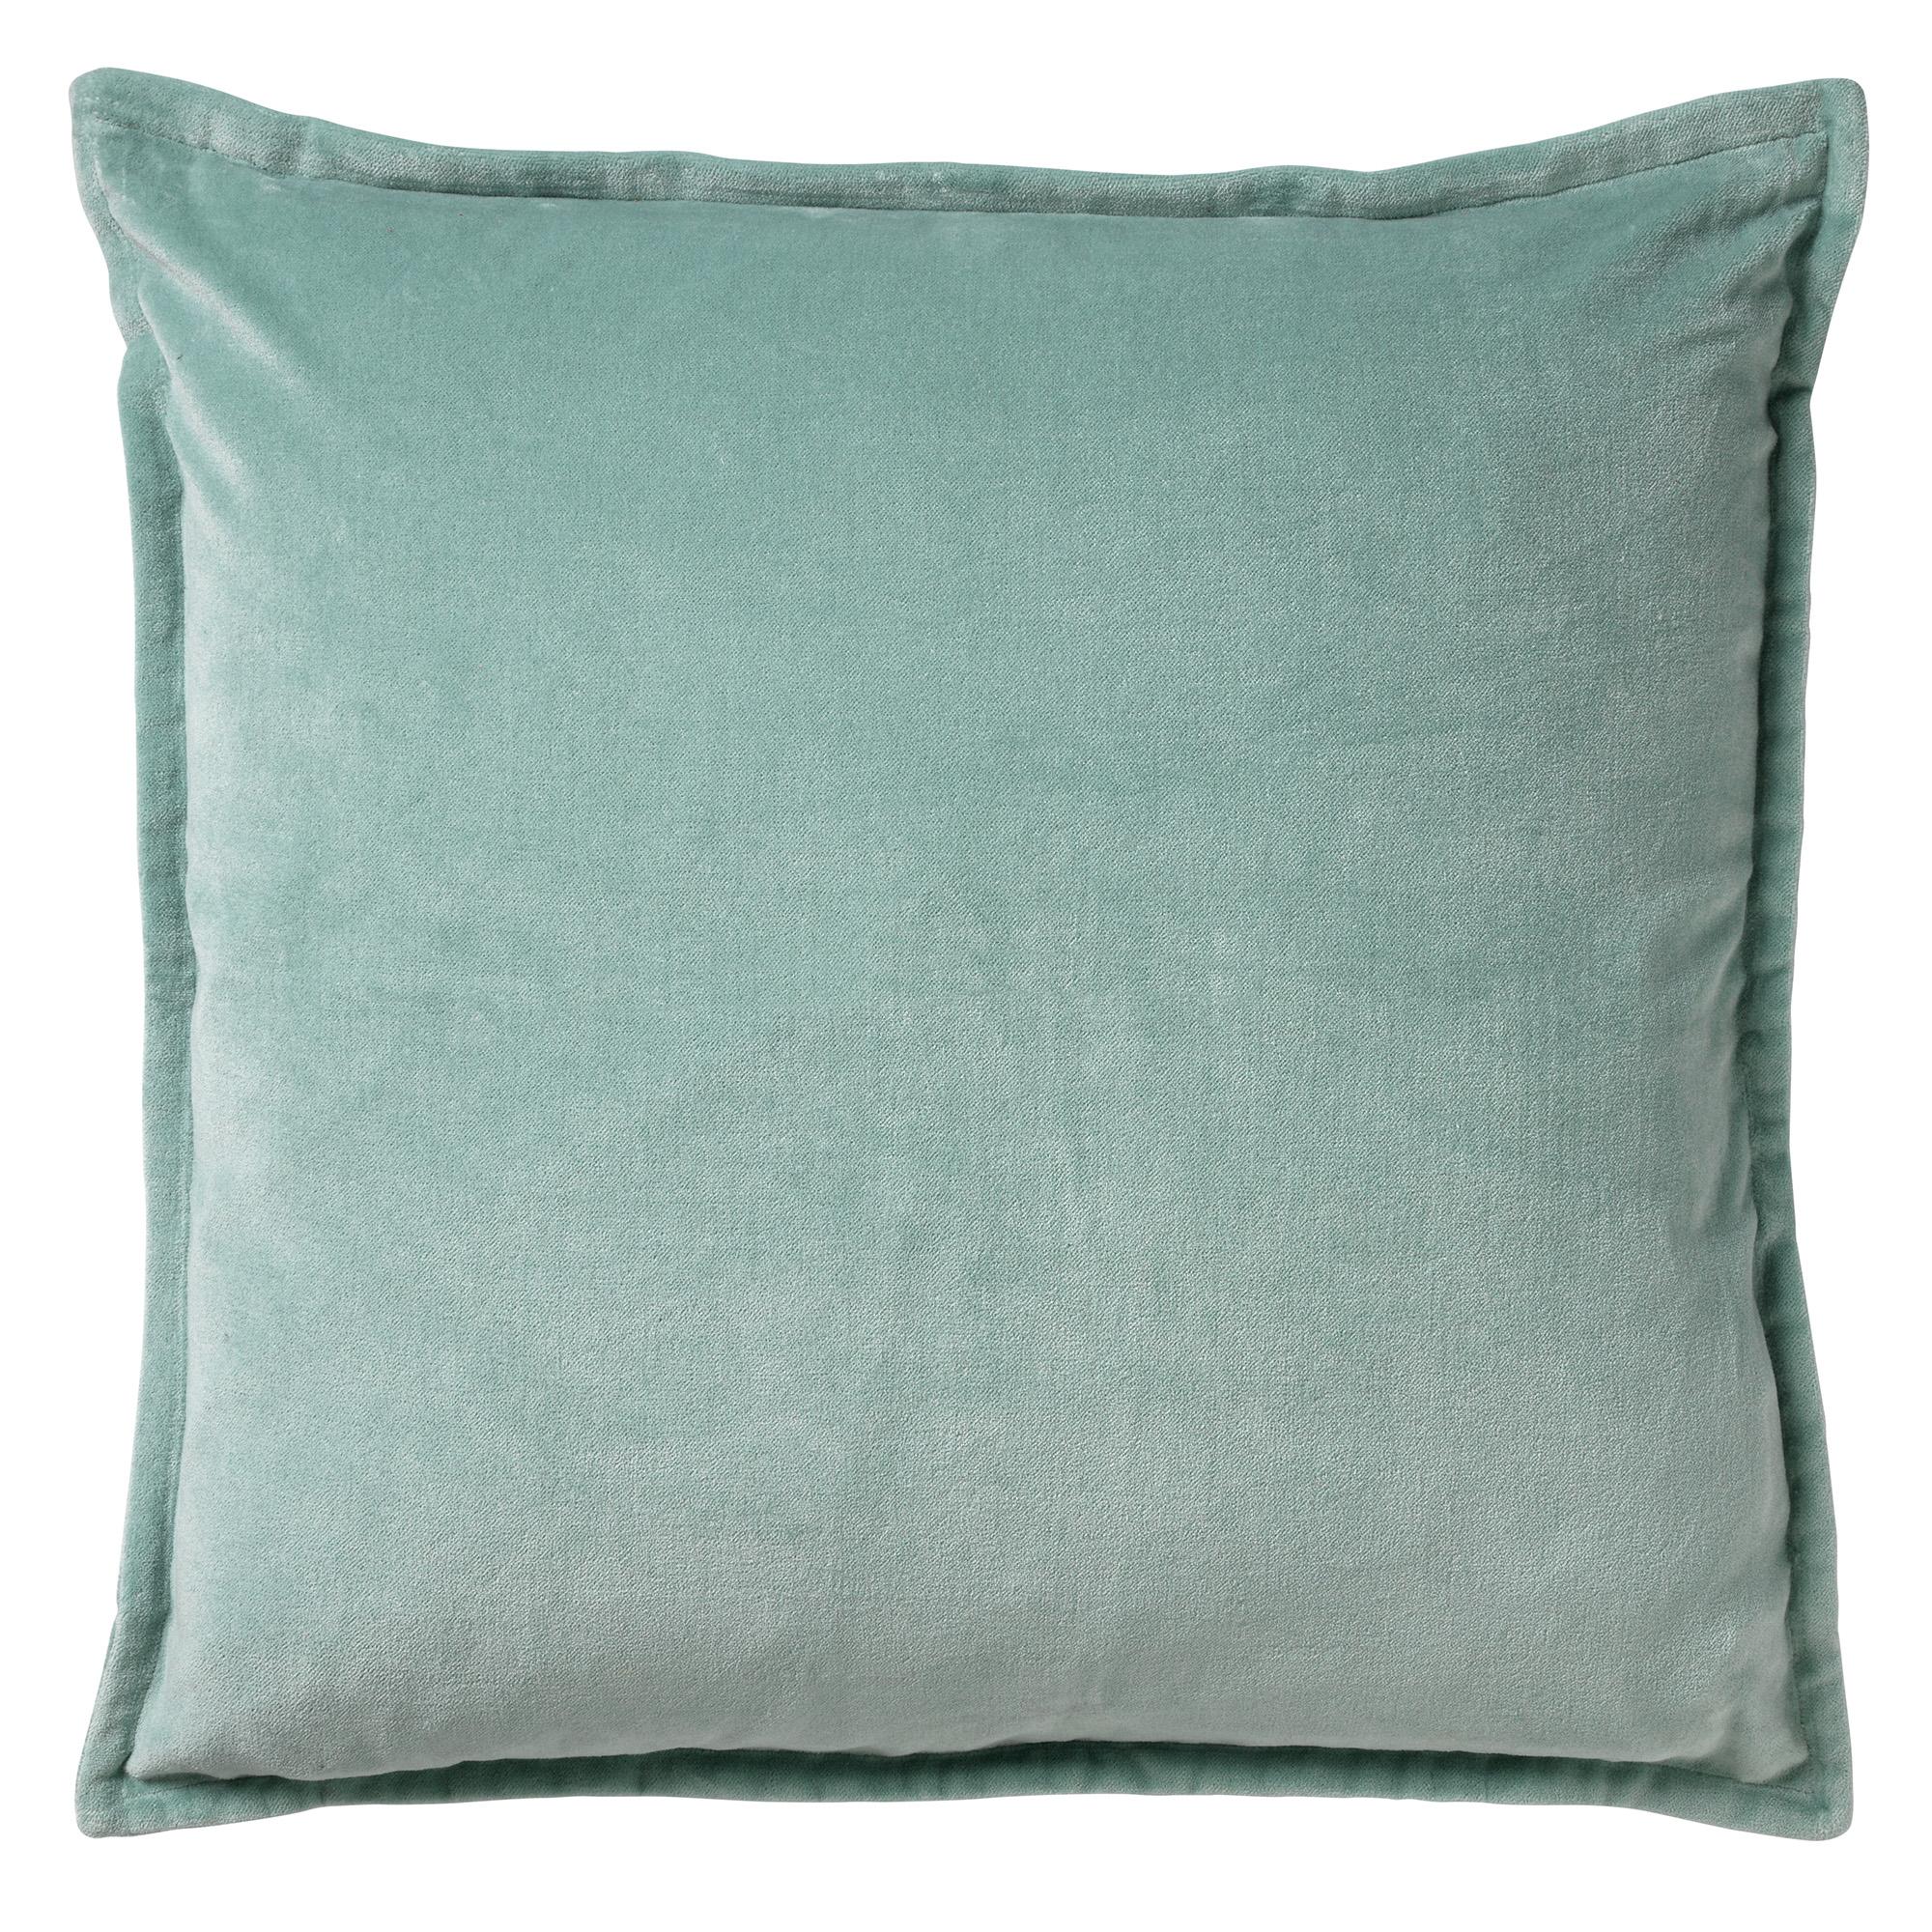 CAITH - Kussenhoes velvet Jadeite 50x50 cm